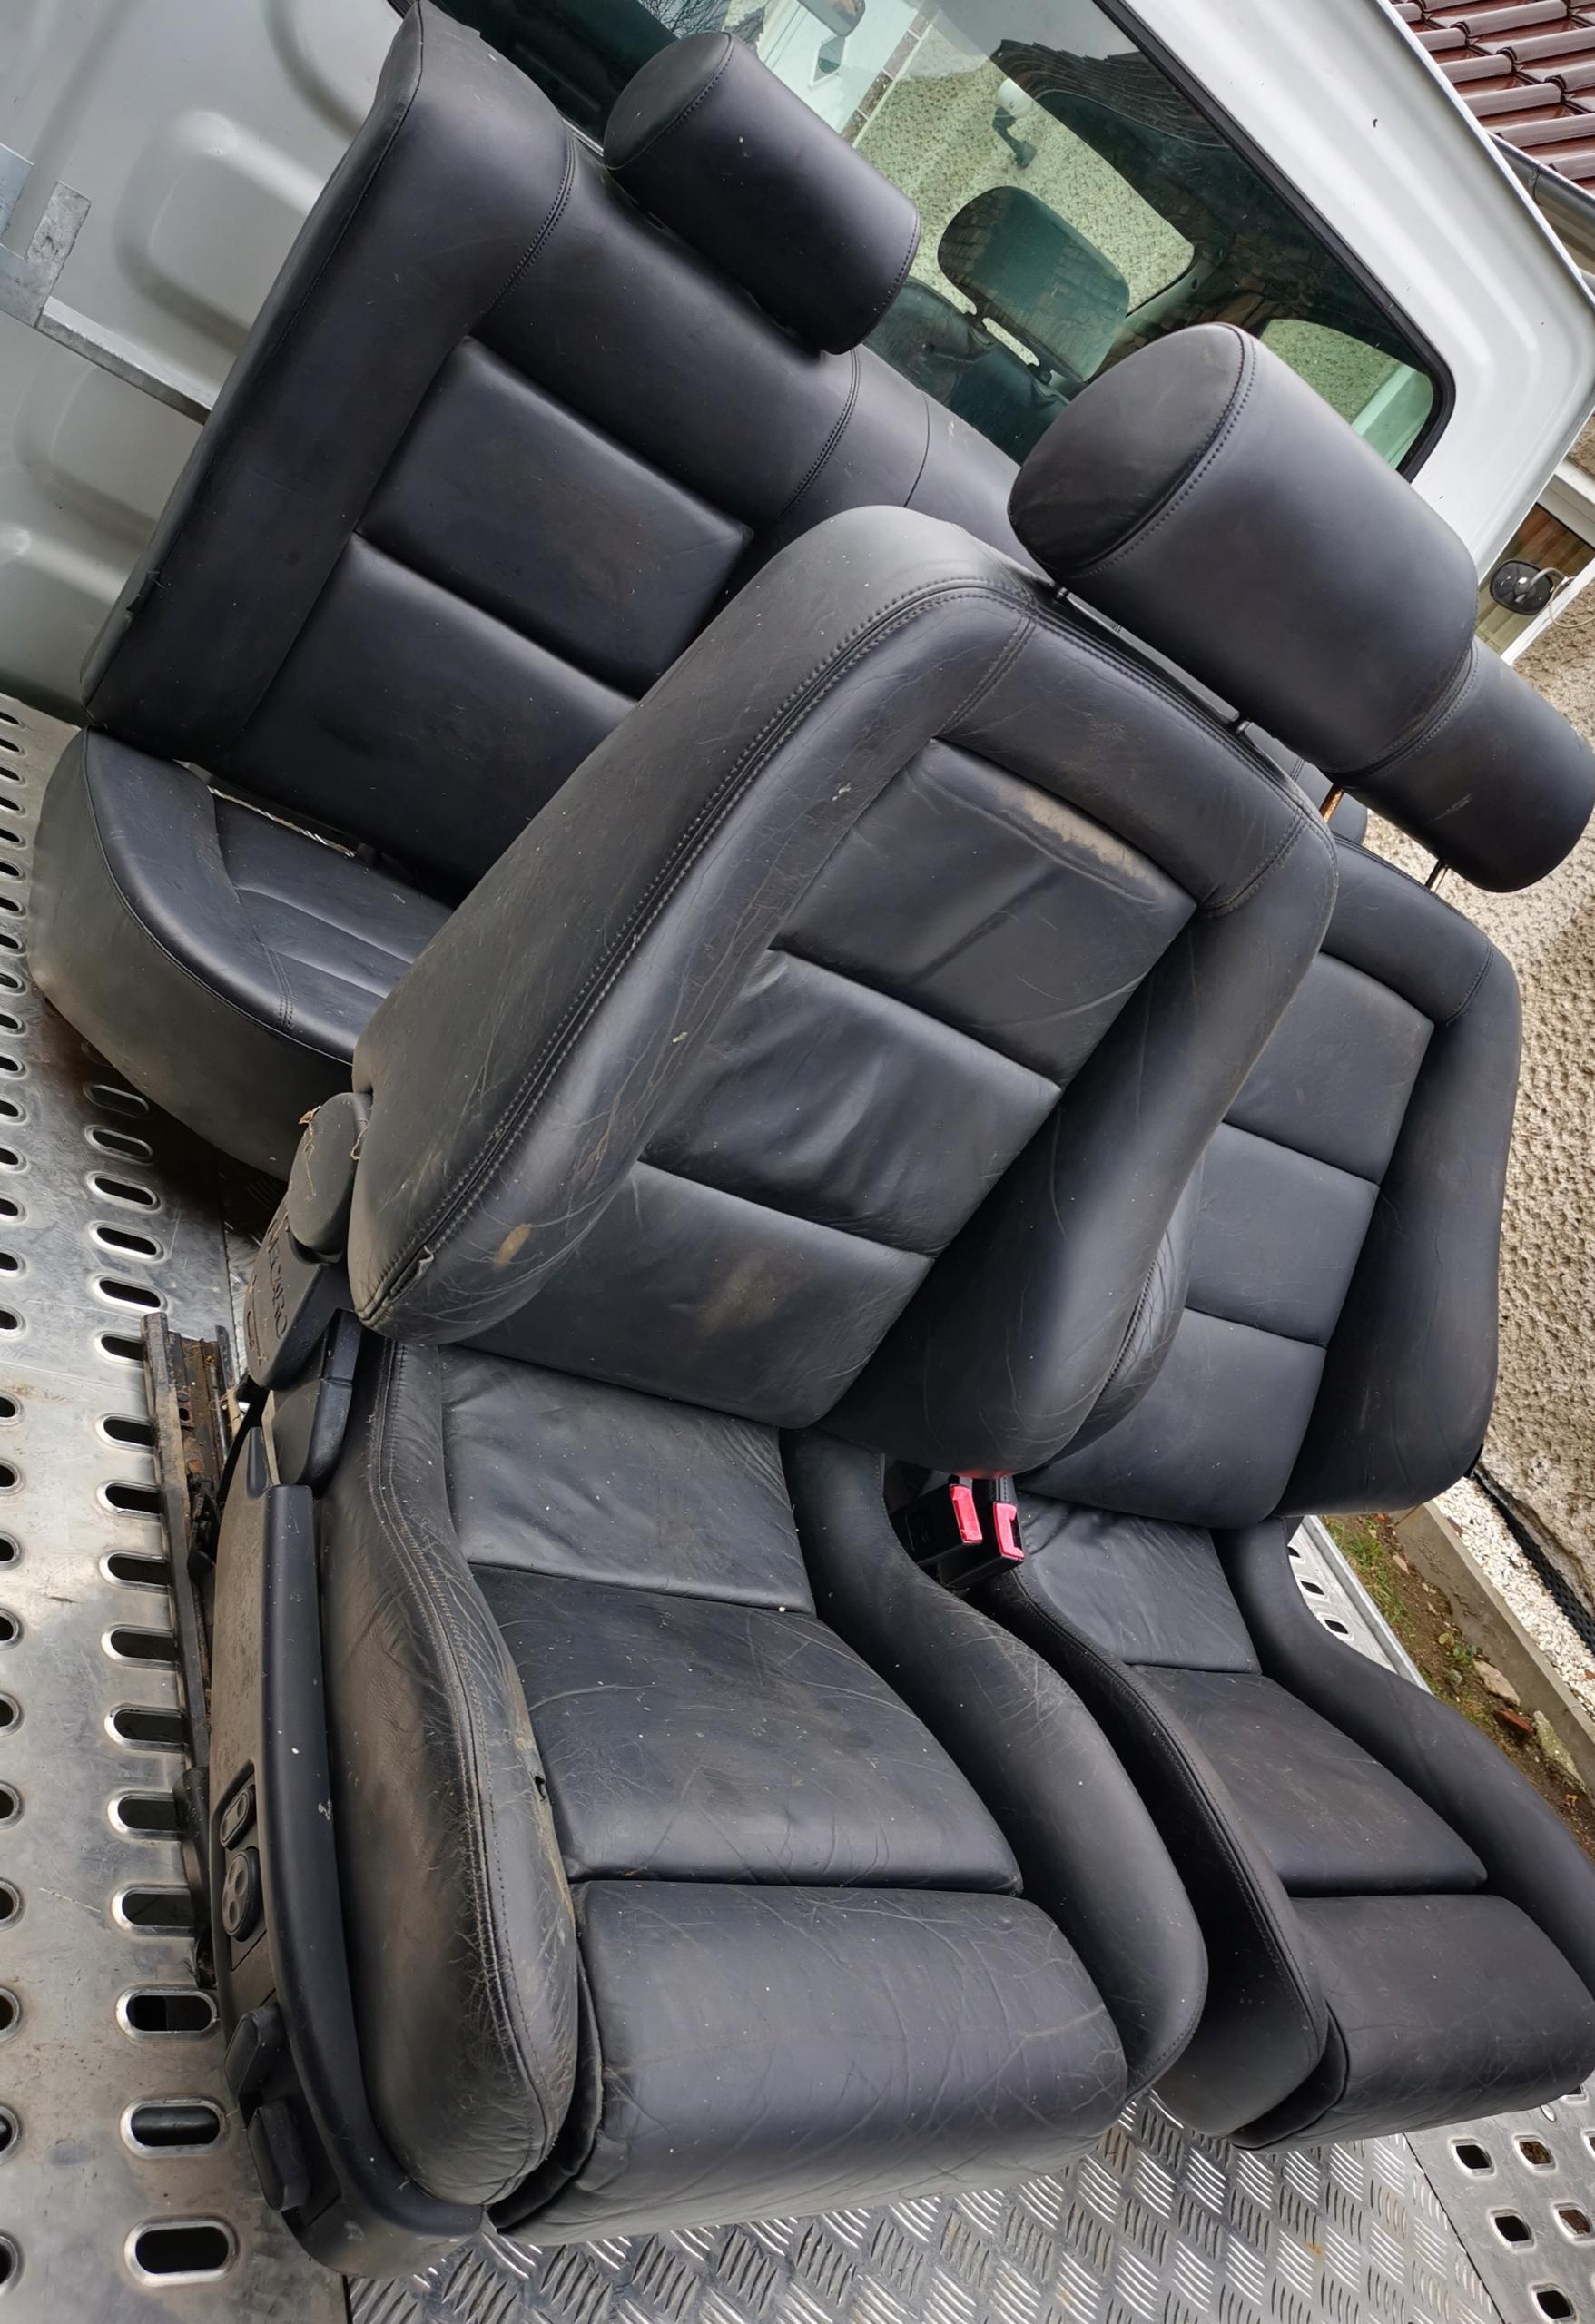 recaro кресла + диван комплект audi a8 d2